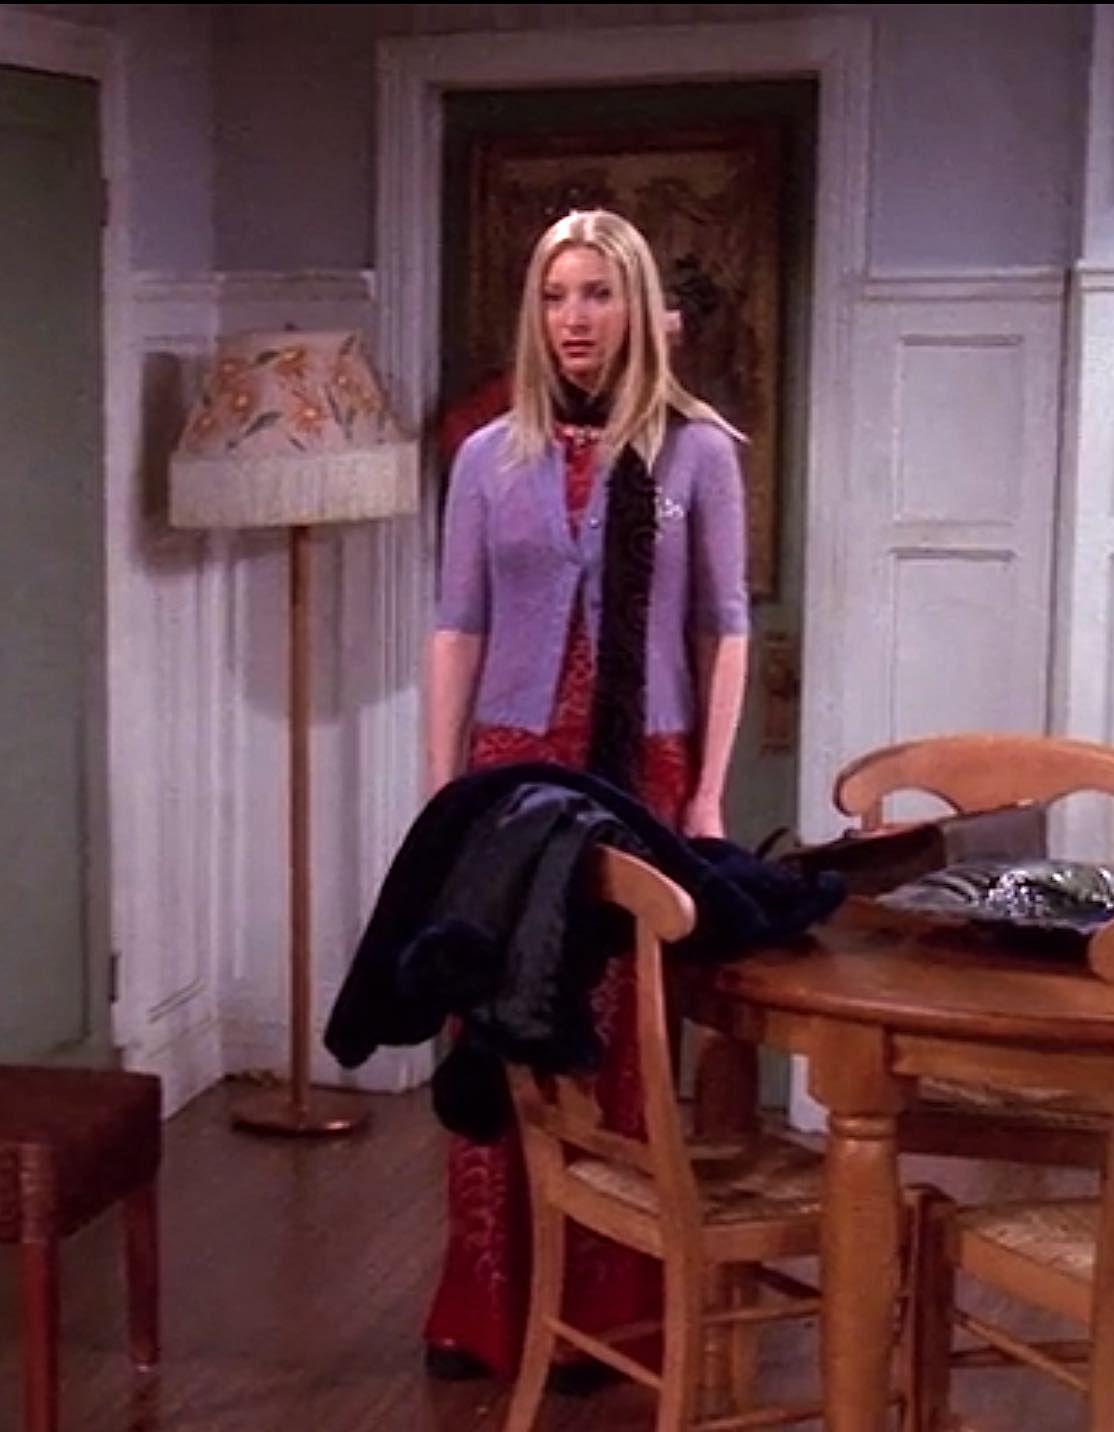 656 Outfits Phoebe Buffay Wore On Friends Fashion Paradoxes Friends Fashion Fashion Phoebe Buffay Outfits [ 1432 x 1114 Pixel ]